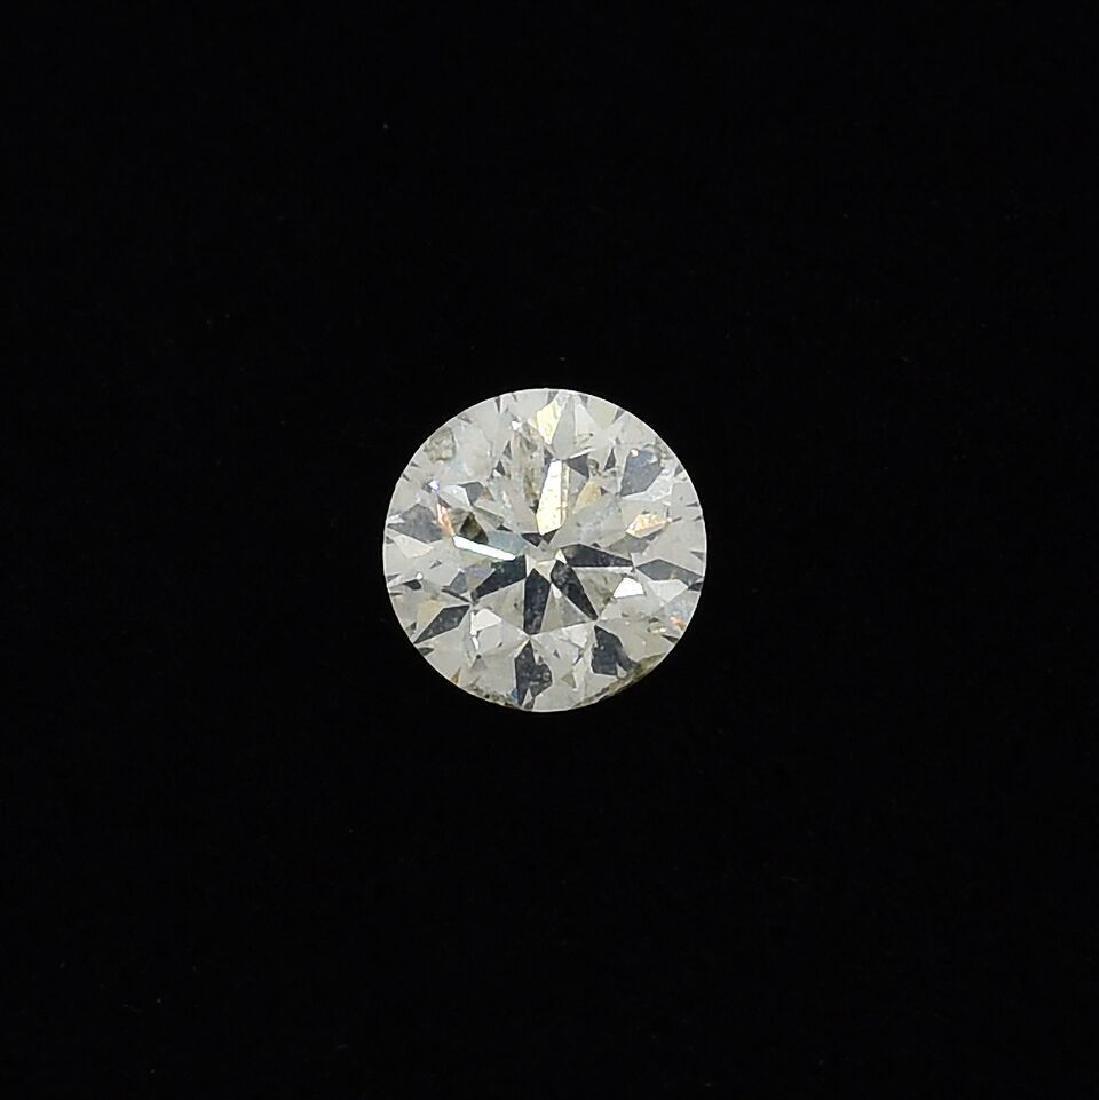 1.05ct SI3 Clarity Diamond Loose Stone (EGL Certified)